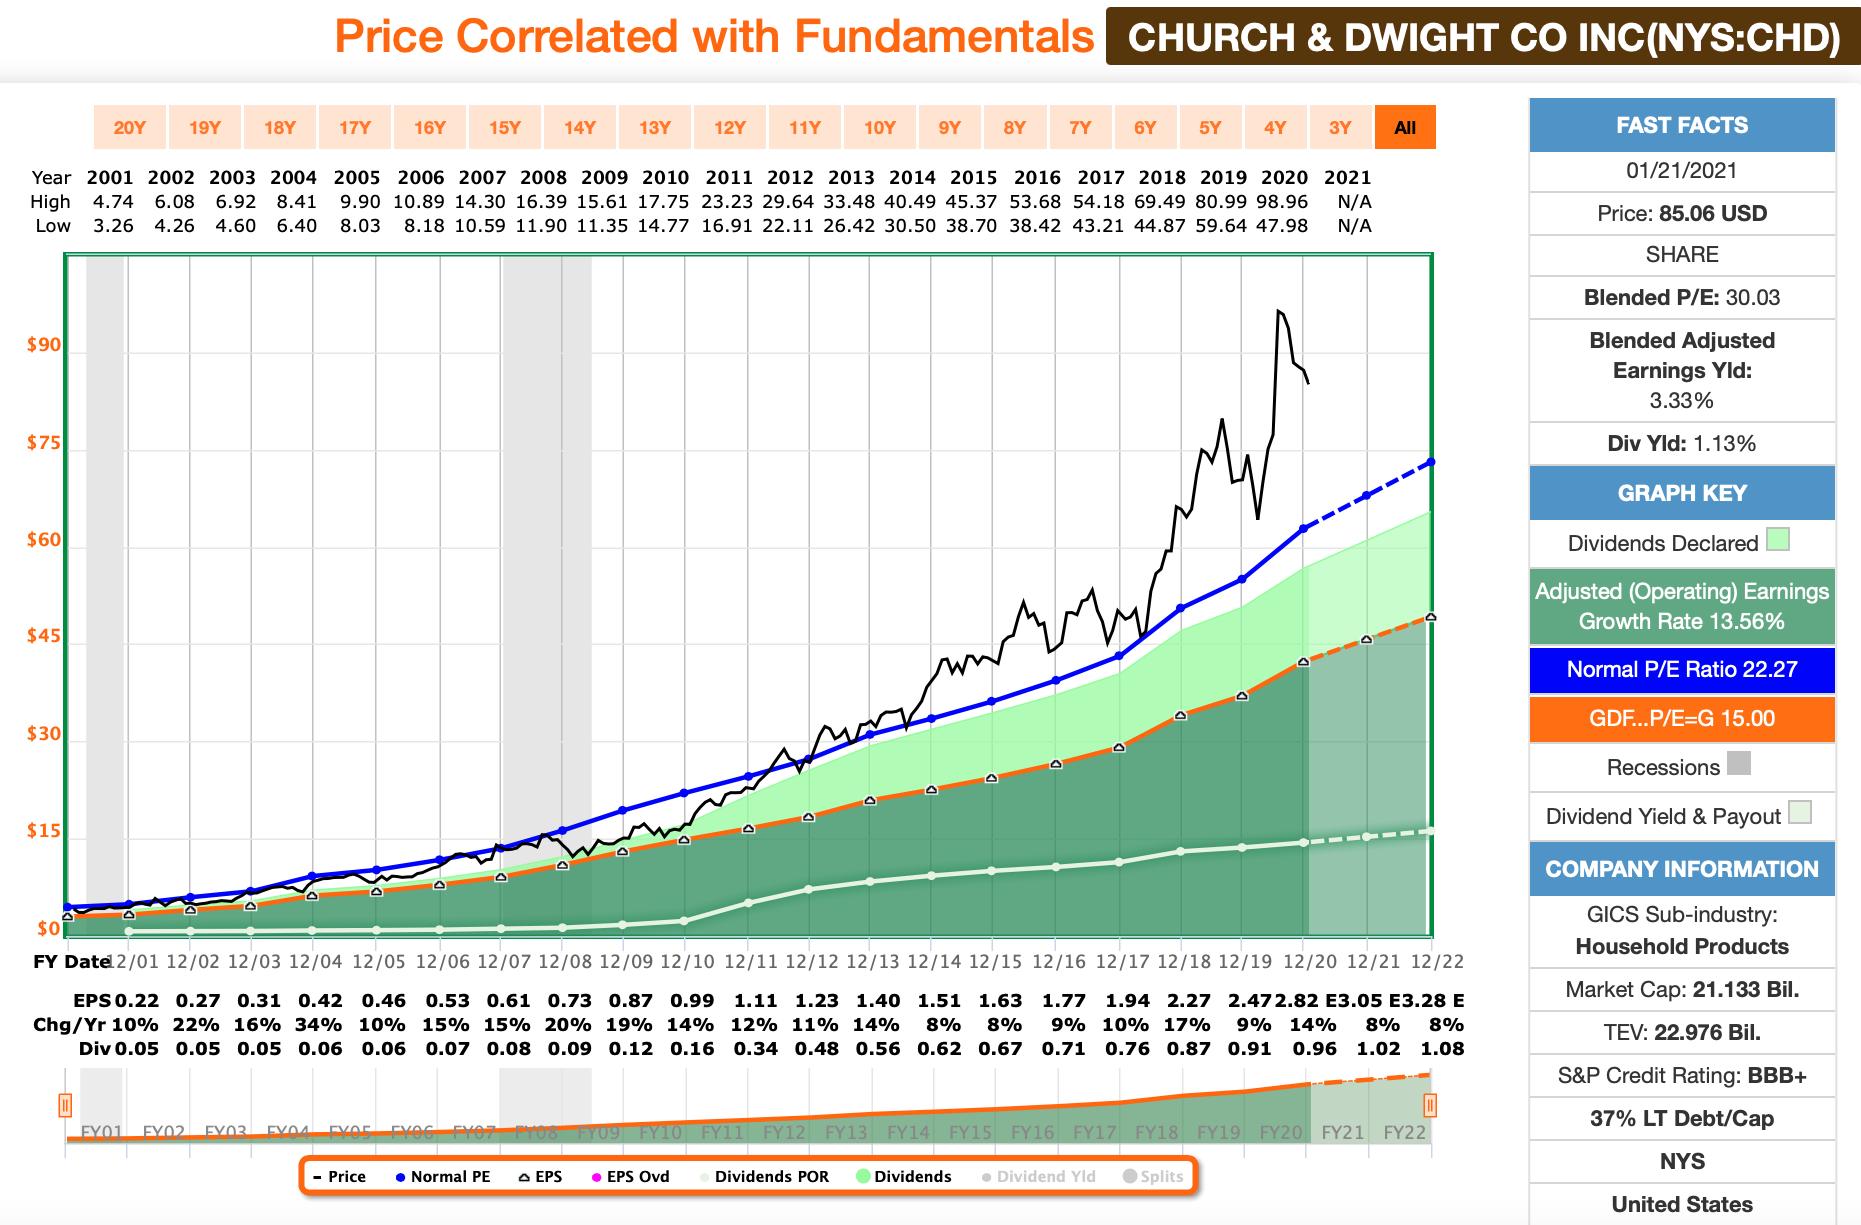 Church & Dwight FastGraphs